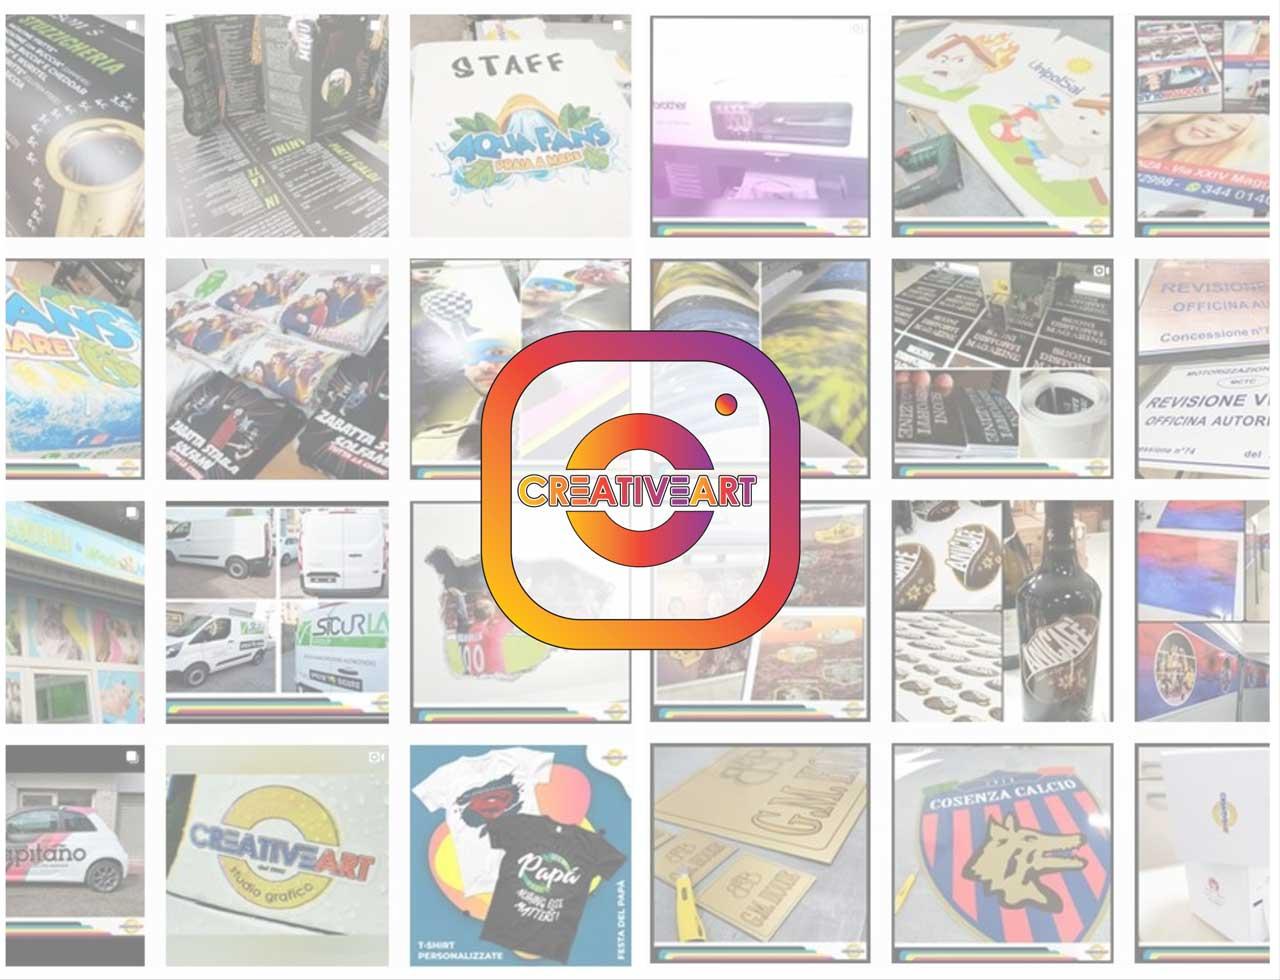 CreativeArt Group - Instagram